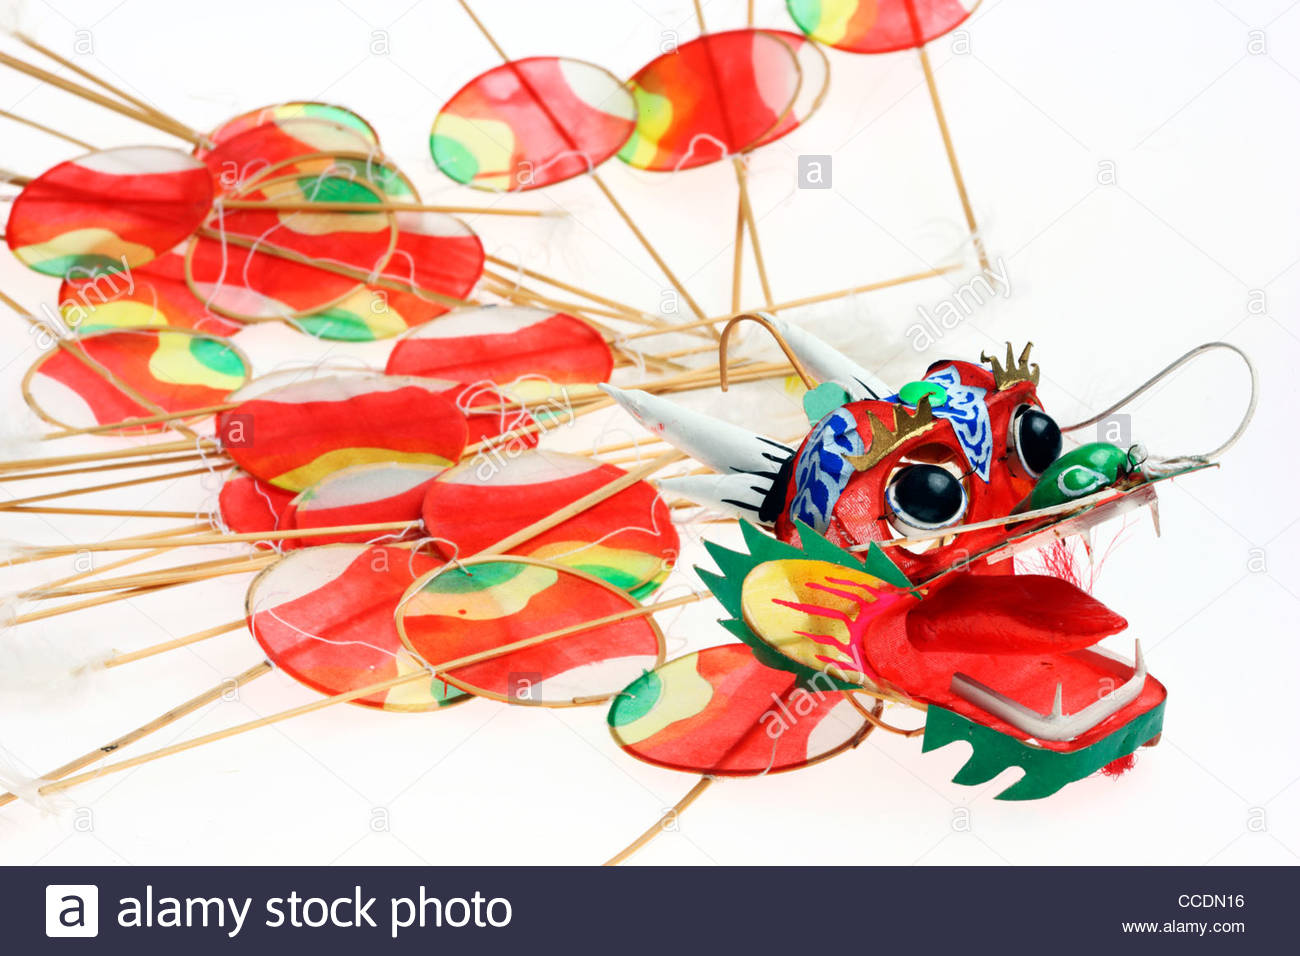 Asian Dragon Kite, Artfully Paper Kite With A Dragon Head Stock.